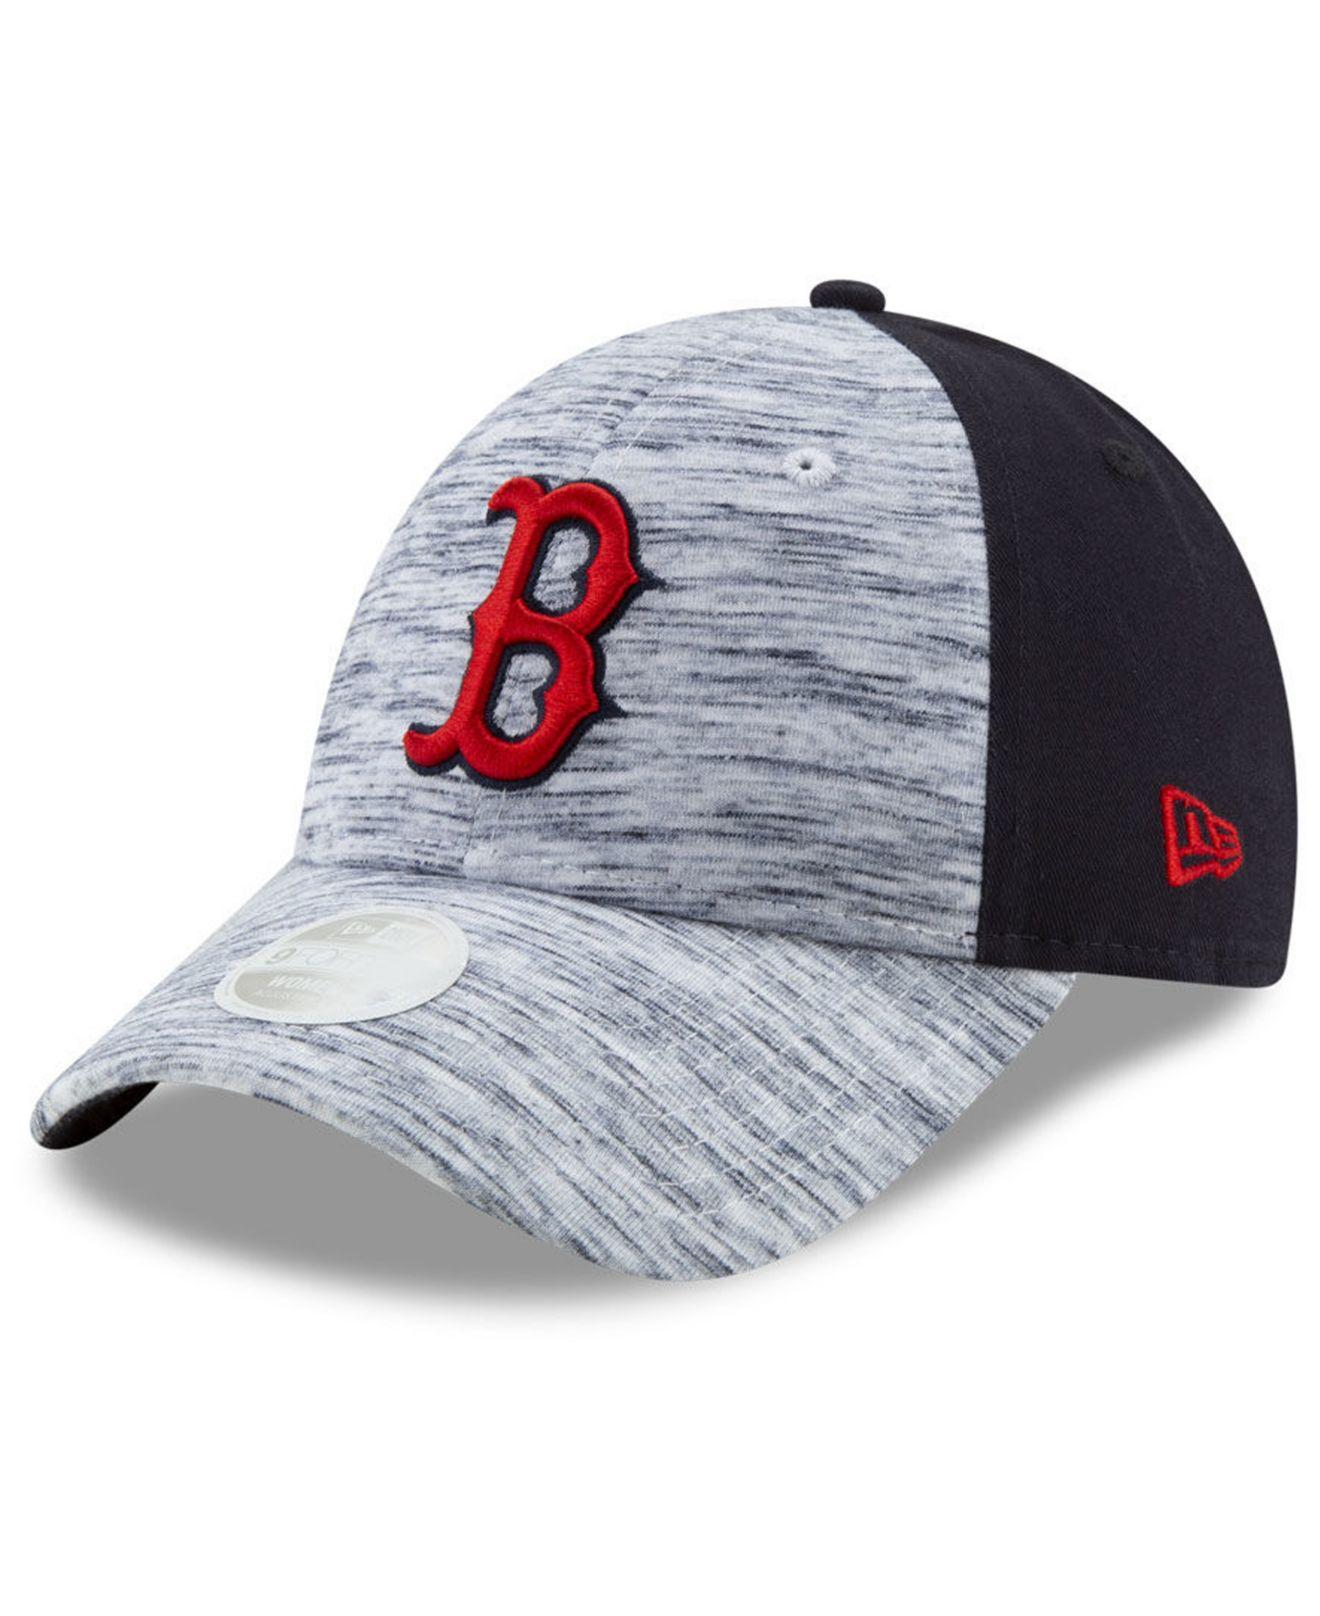 e8db28f0aeb Lyst - KTZ Boston Red Sox Space Dye 9forty Cap in Blue